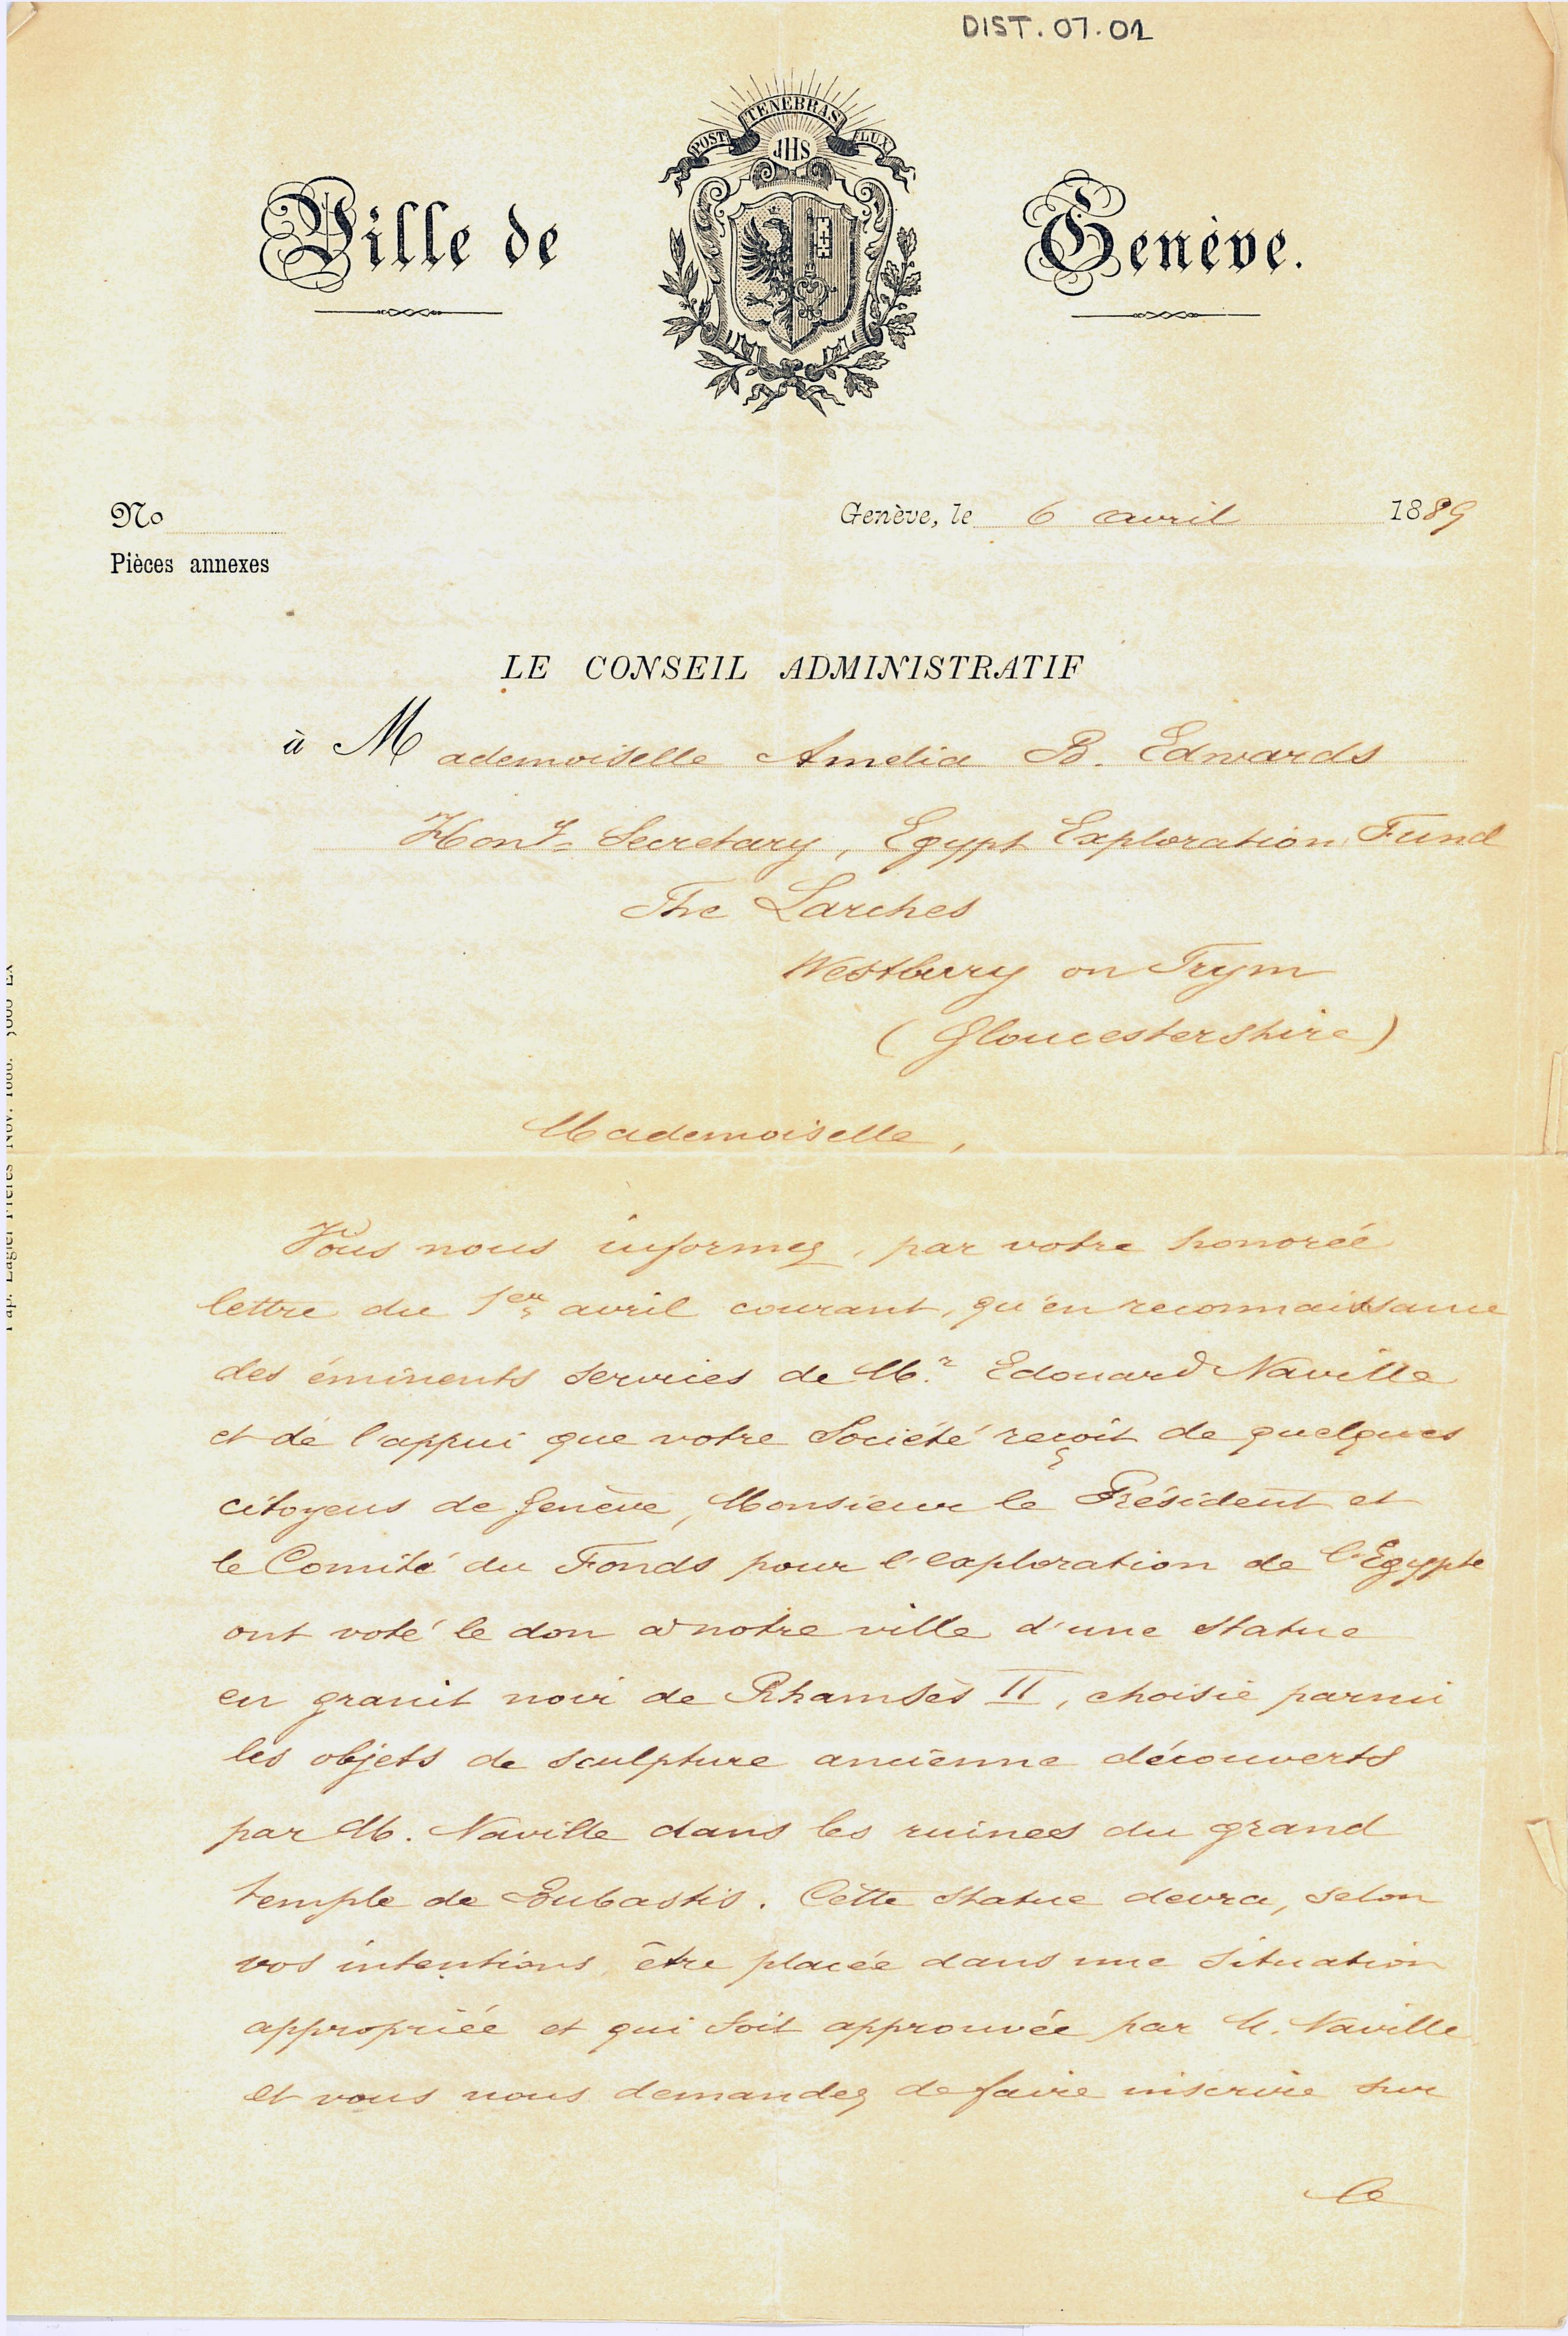 1889 Bubastis DIST.07.02a